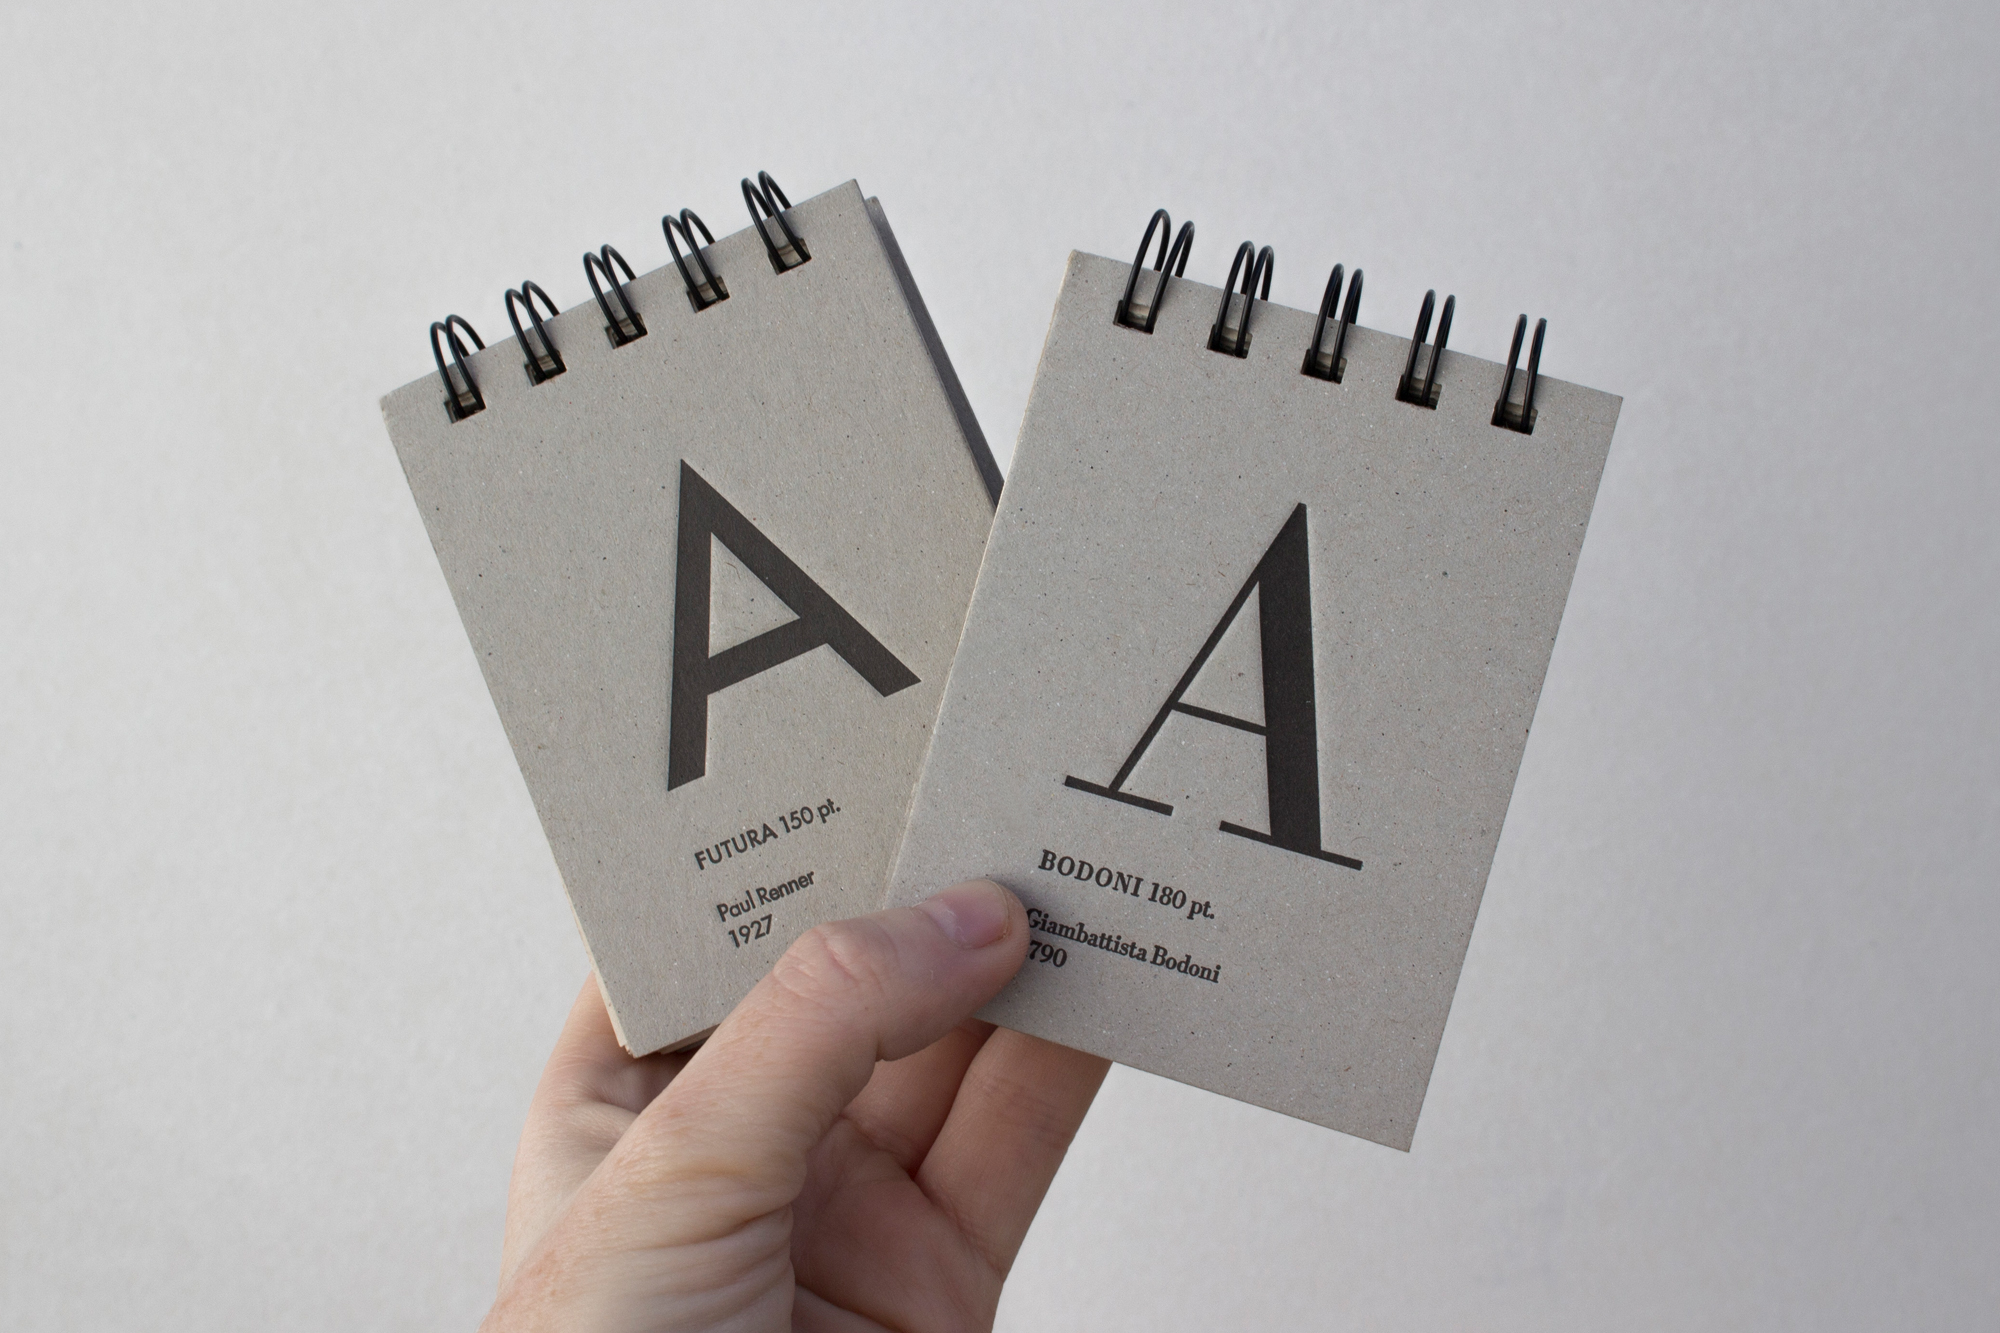 anotador-a6-coleccion-colecciona-papel-principal-letterpress-imprenta-tipografica-1.jpg